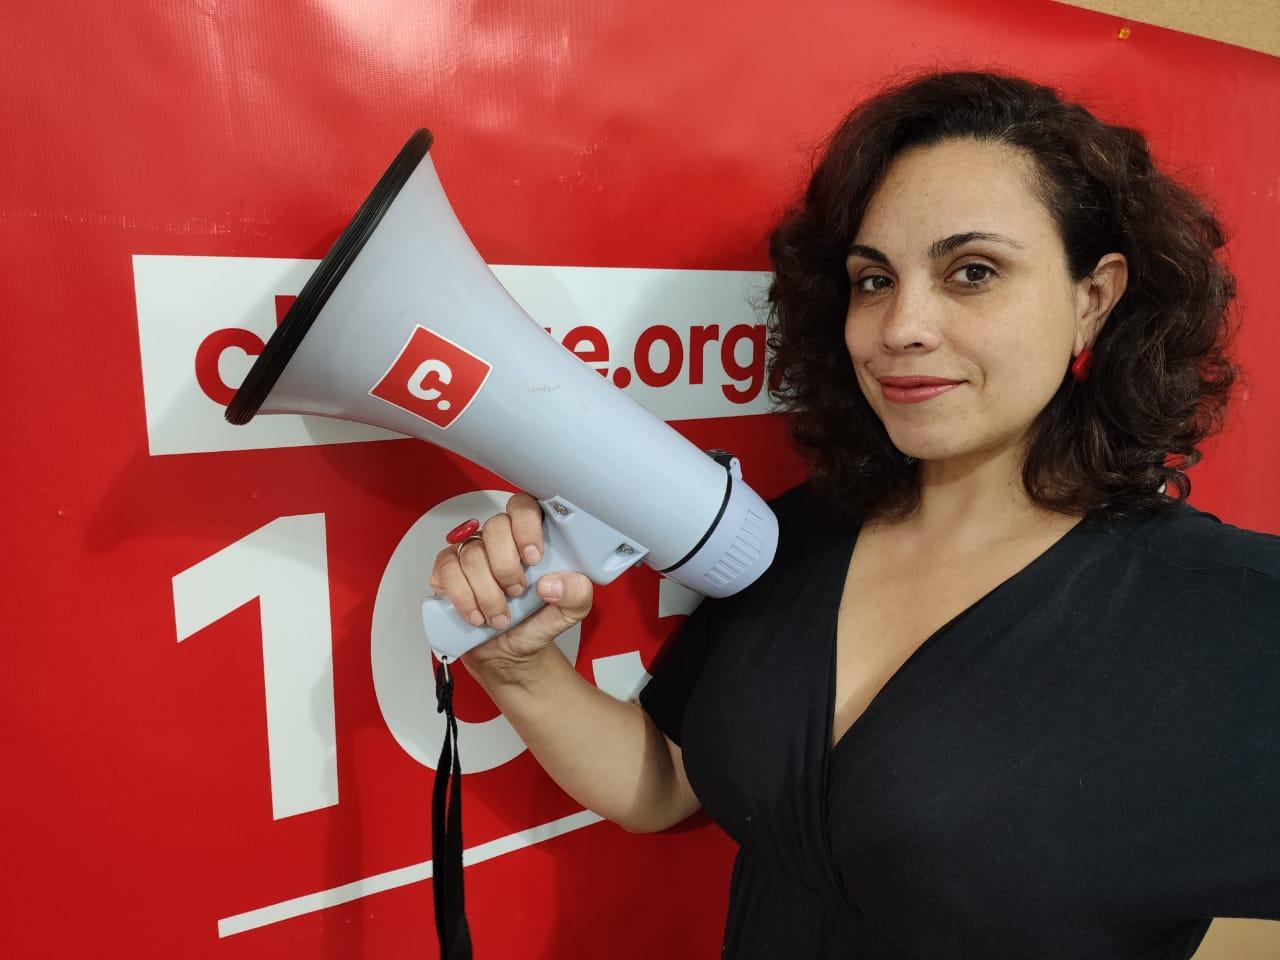 Monica Souza, diretora-executiva da Change.org Brasil (Foto: Anne Galvão/Change.org)